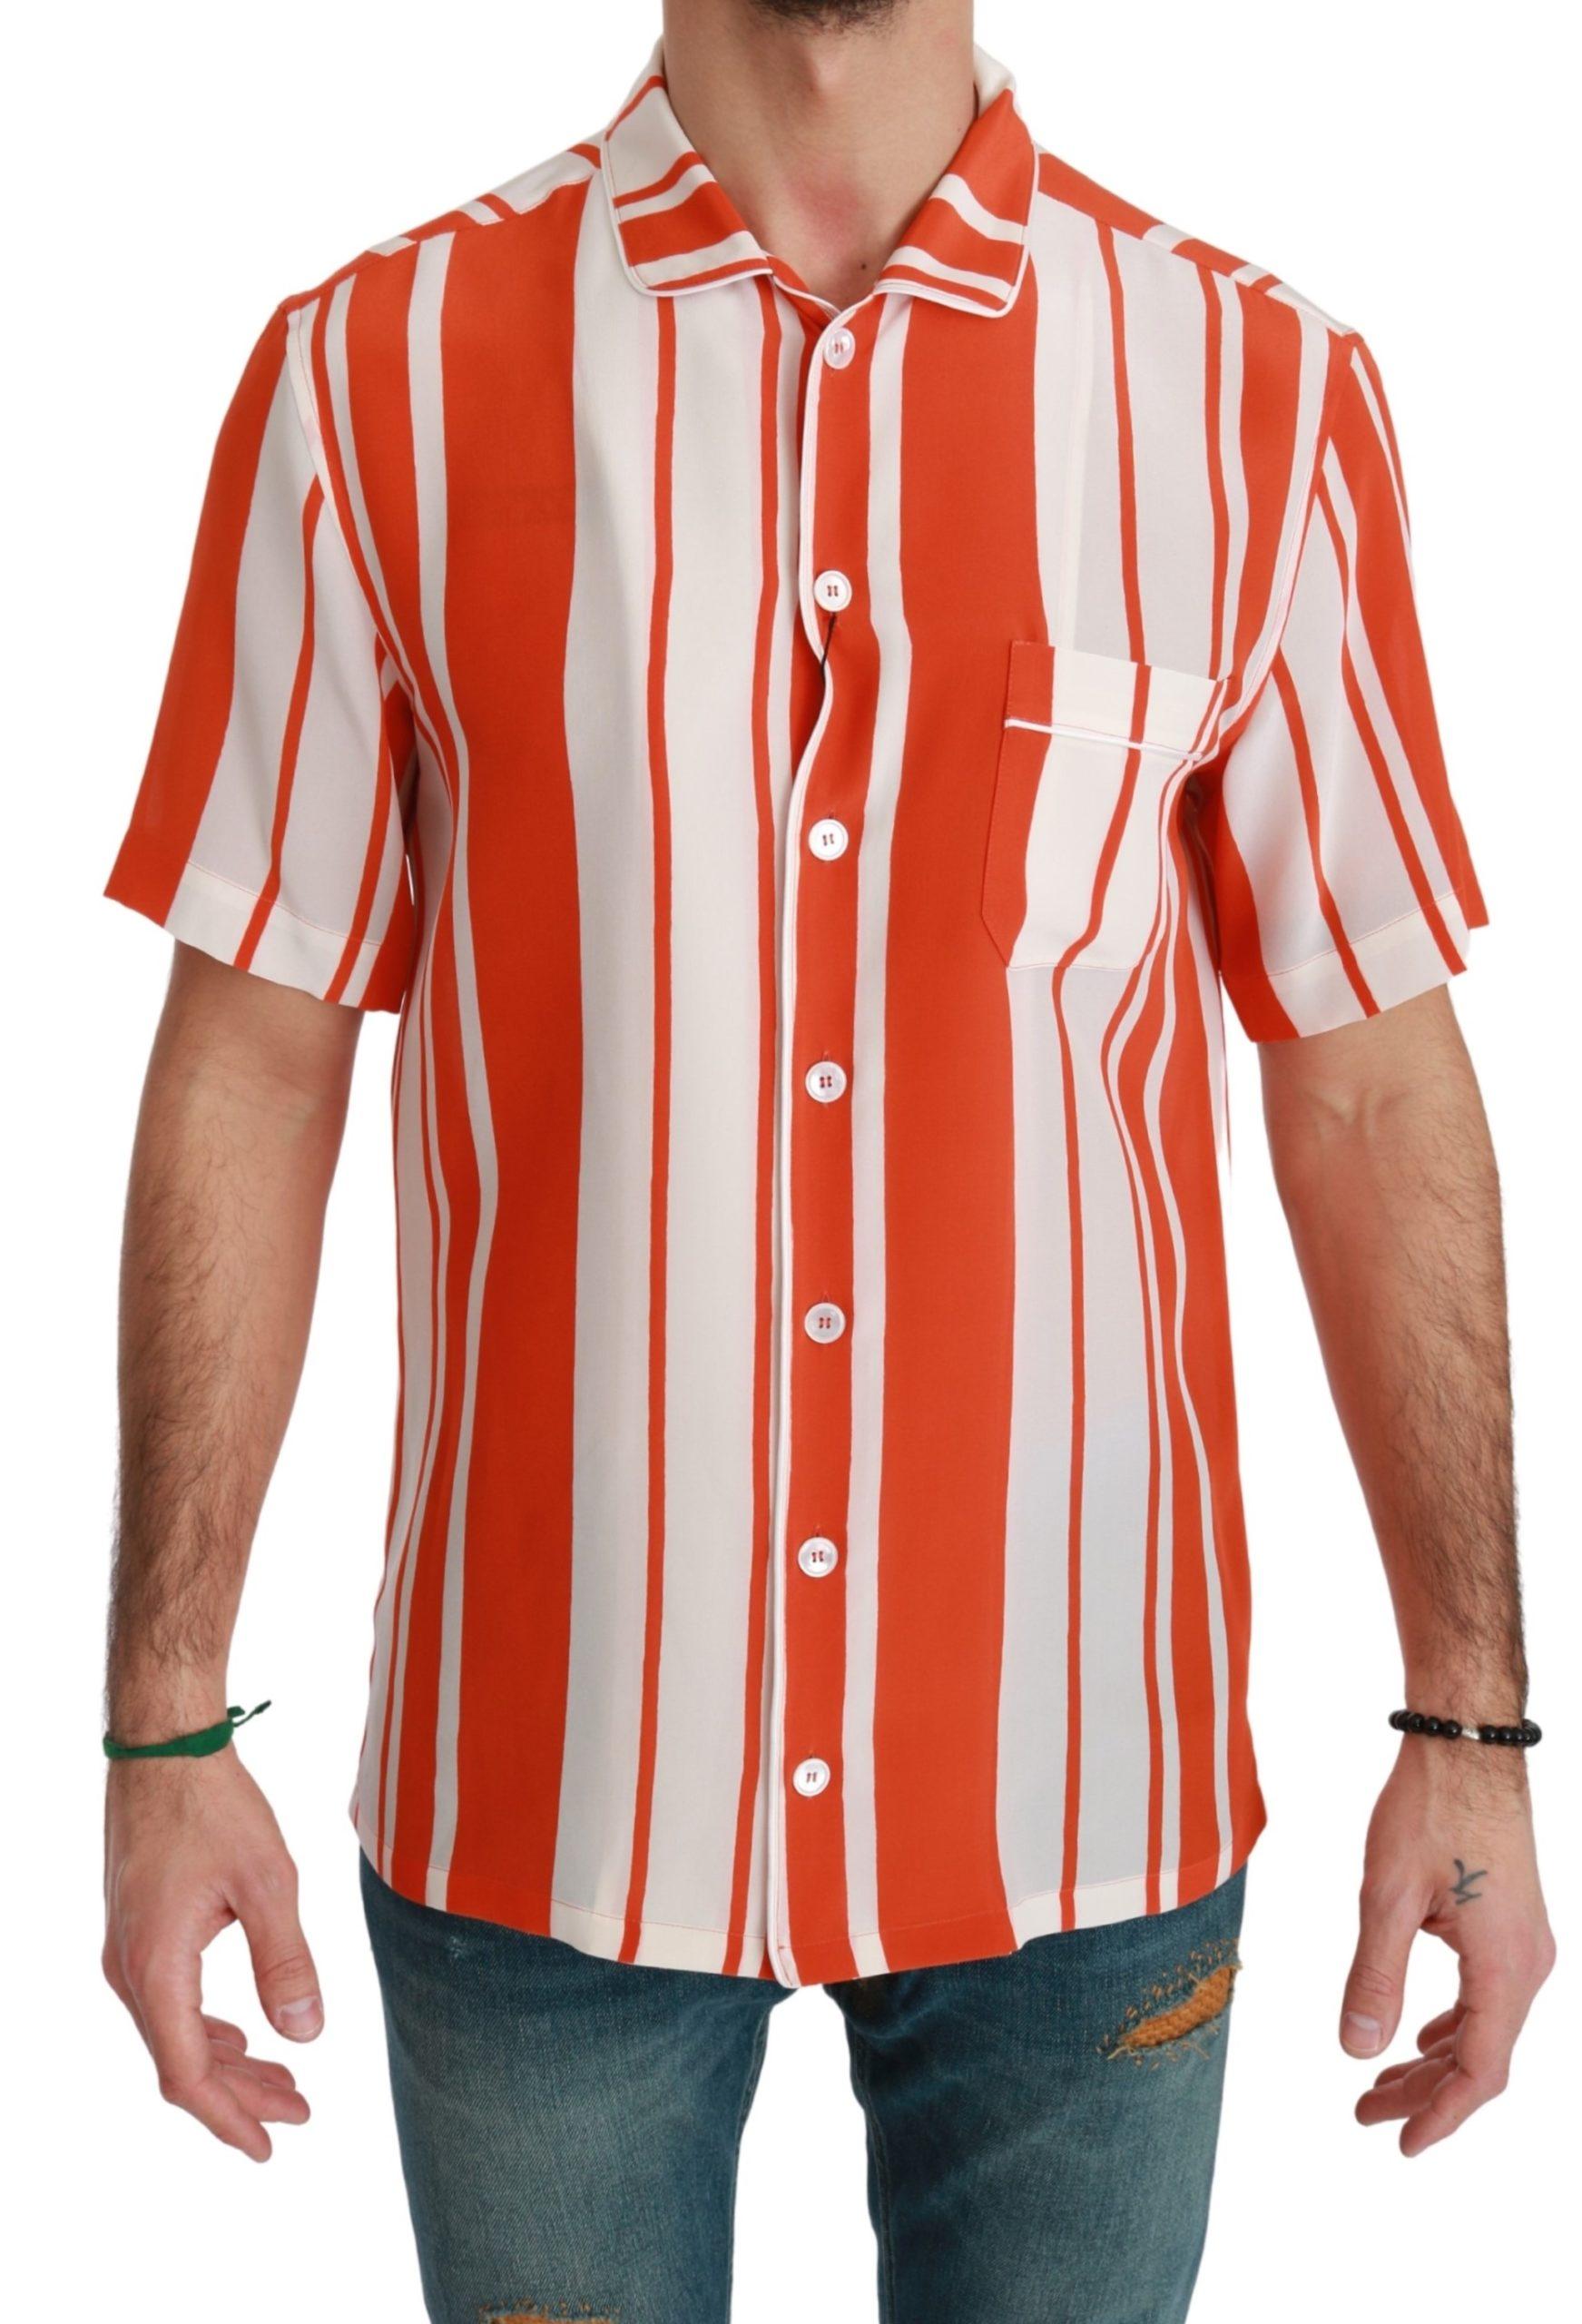 Dolce & Gabbana Men's Silk Striped Short Sleeve Shirt Orange TSH4655 - IT38 | XS